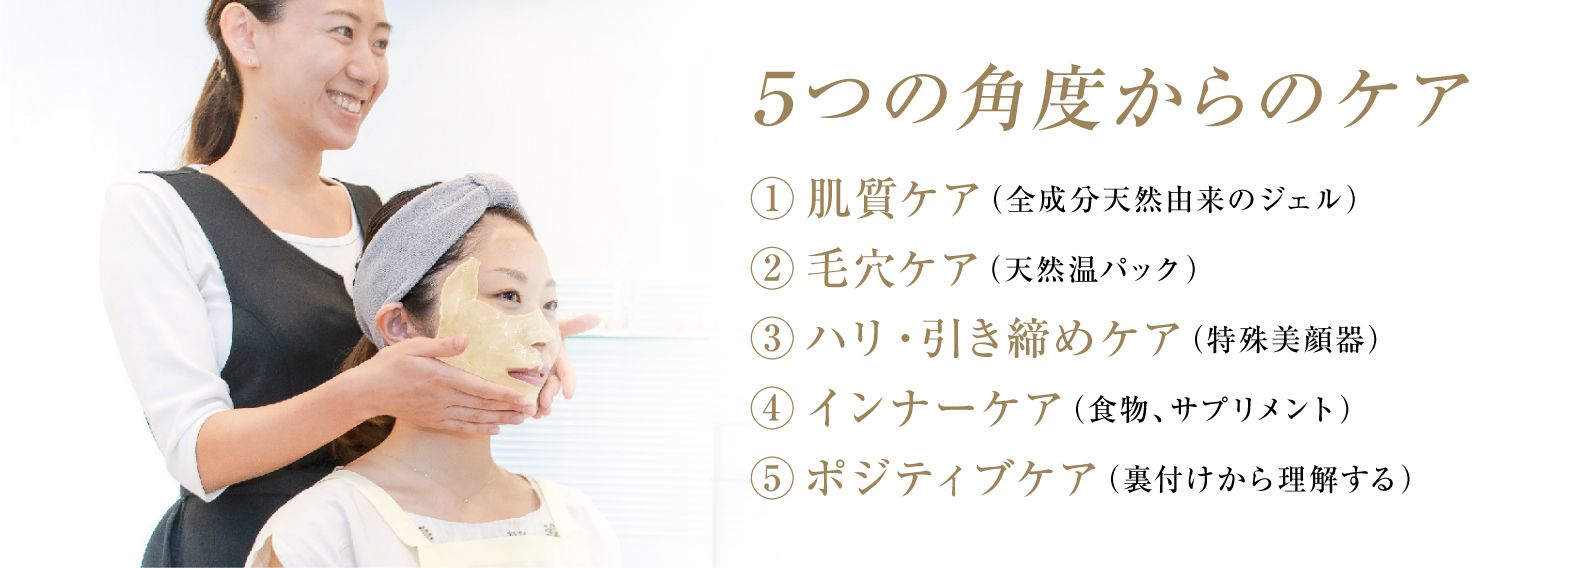 GINZA myufull 銀座ミューフル